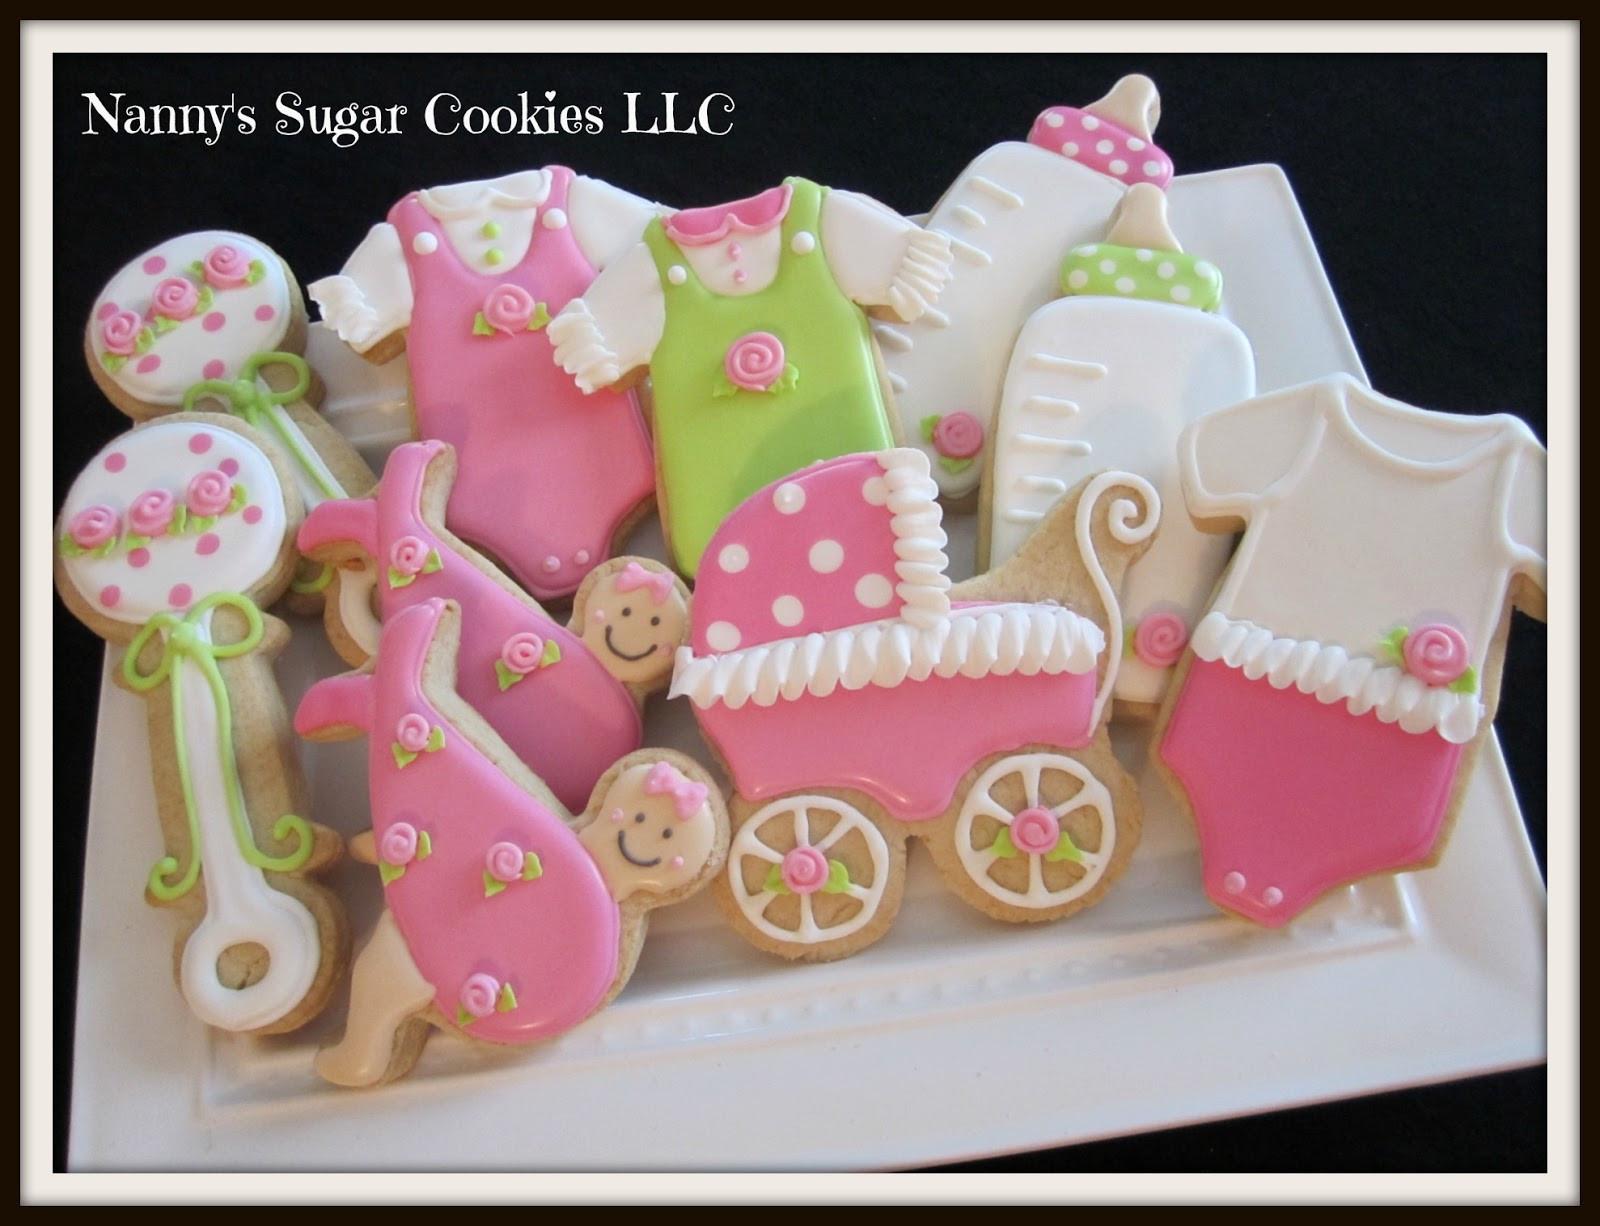 Baby Shower Sugar Cookies  Nanny s Sugar Cookies LLC Baby Shower Cookie Favors